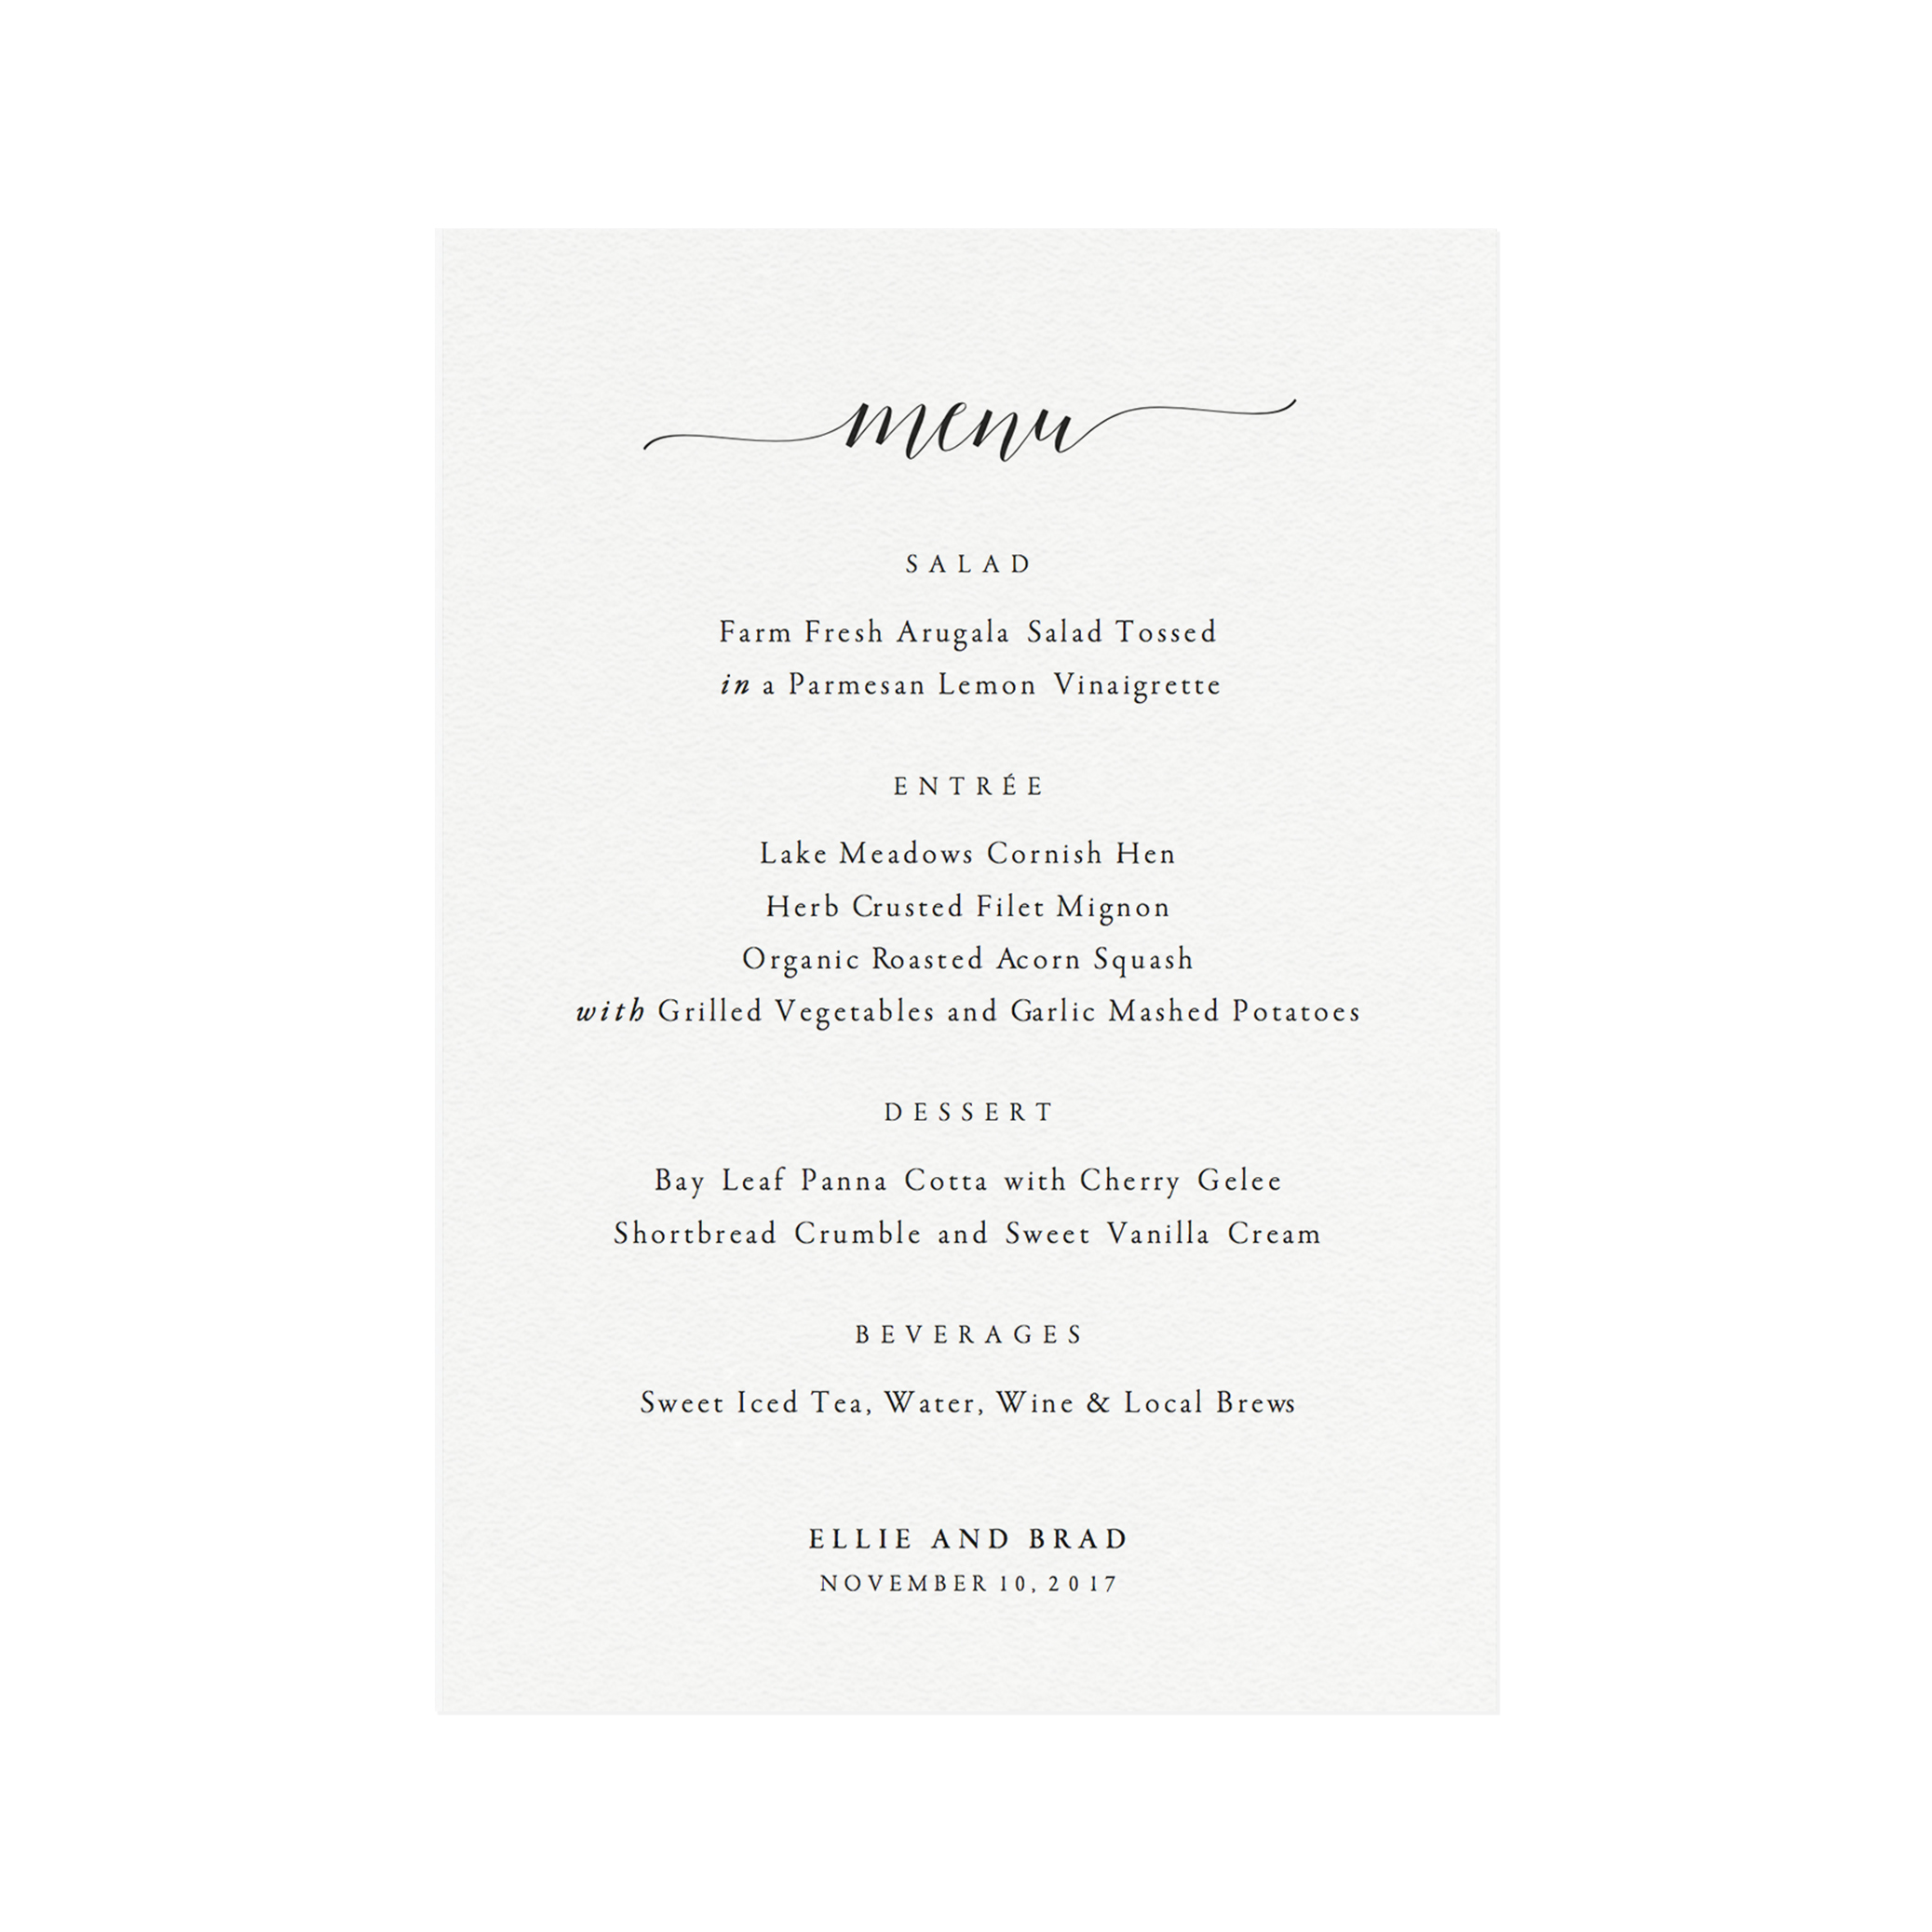 Jolly Adel Printable Wedding Menu Template Adel Printable Wedding Menu Template Simply Suite Wedding Menu Template Online Wedding Menu Template 4x6 wedding Wedding Menu Template